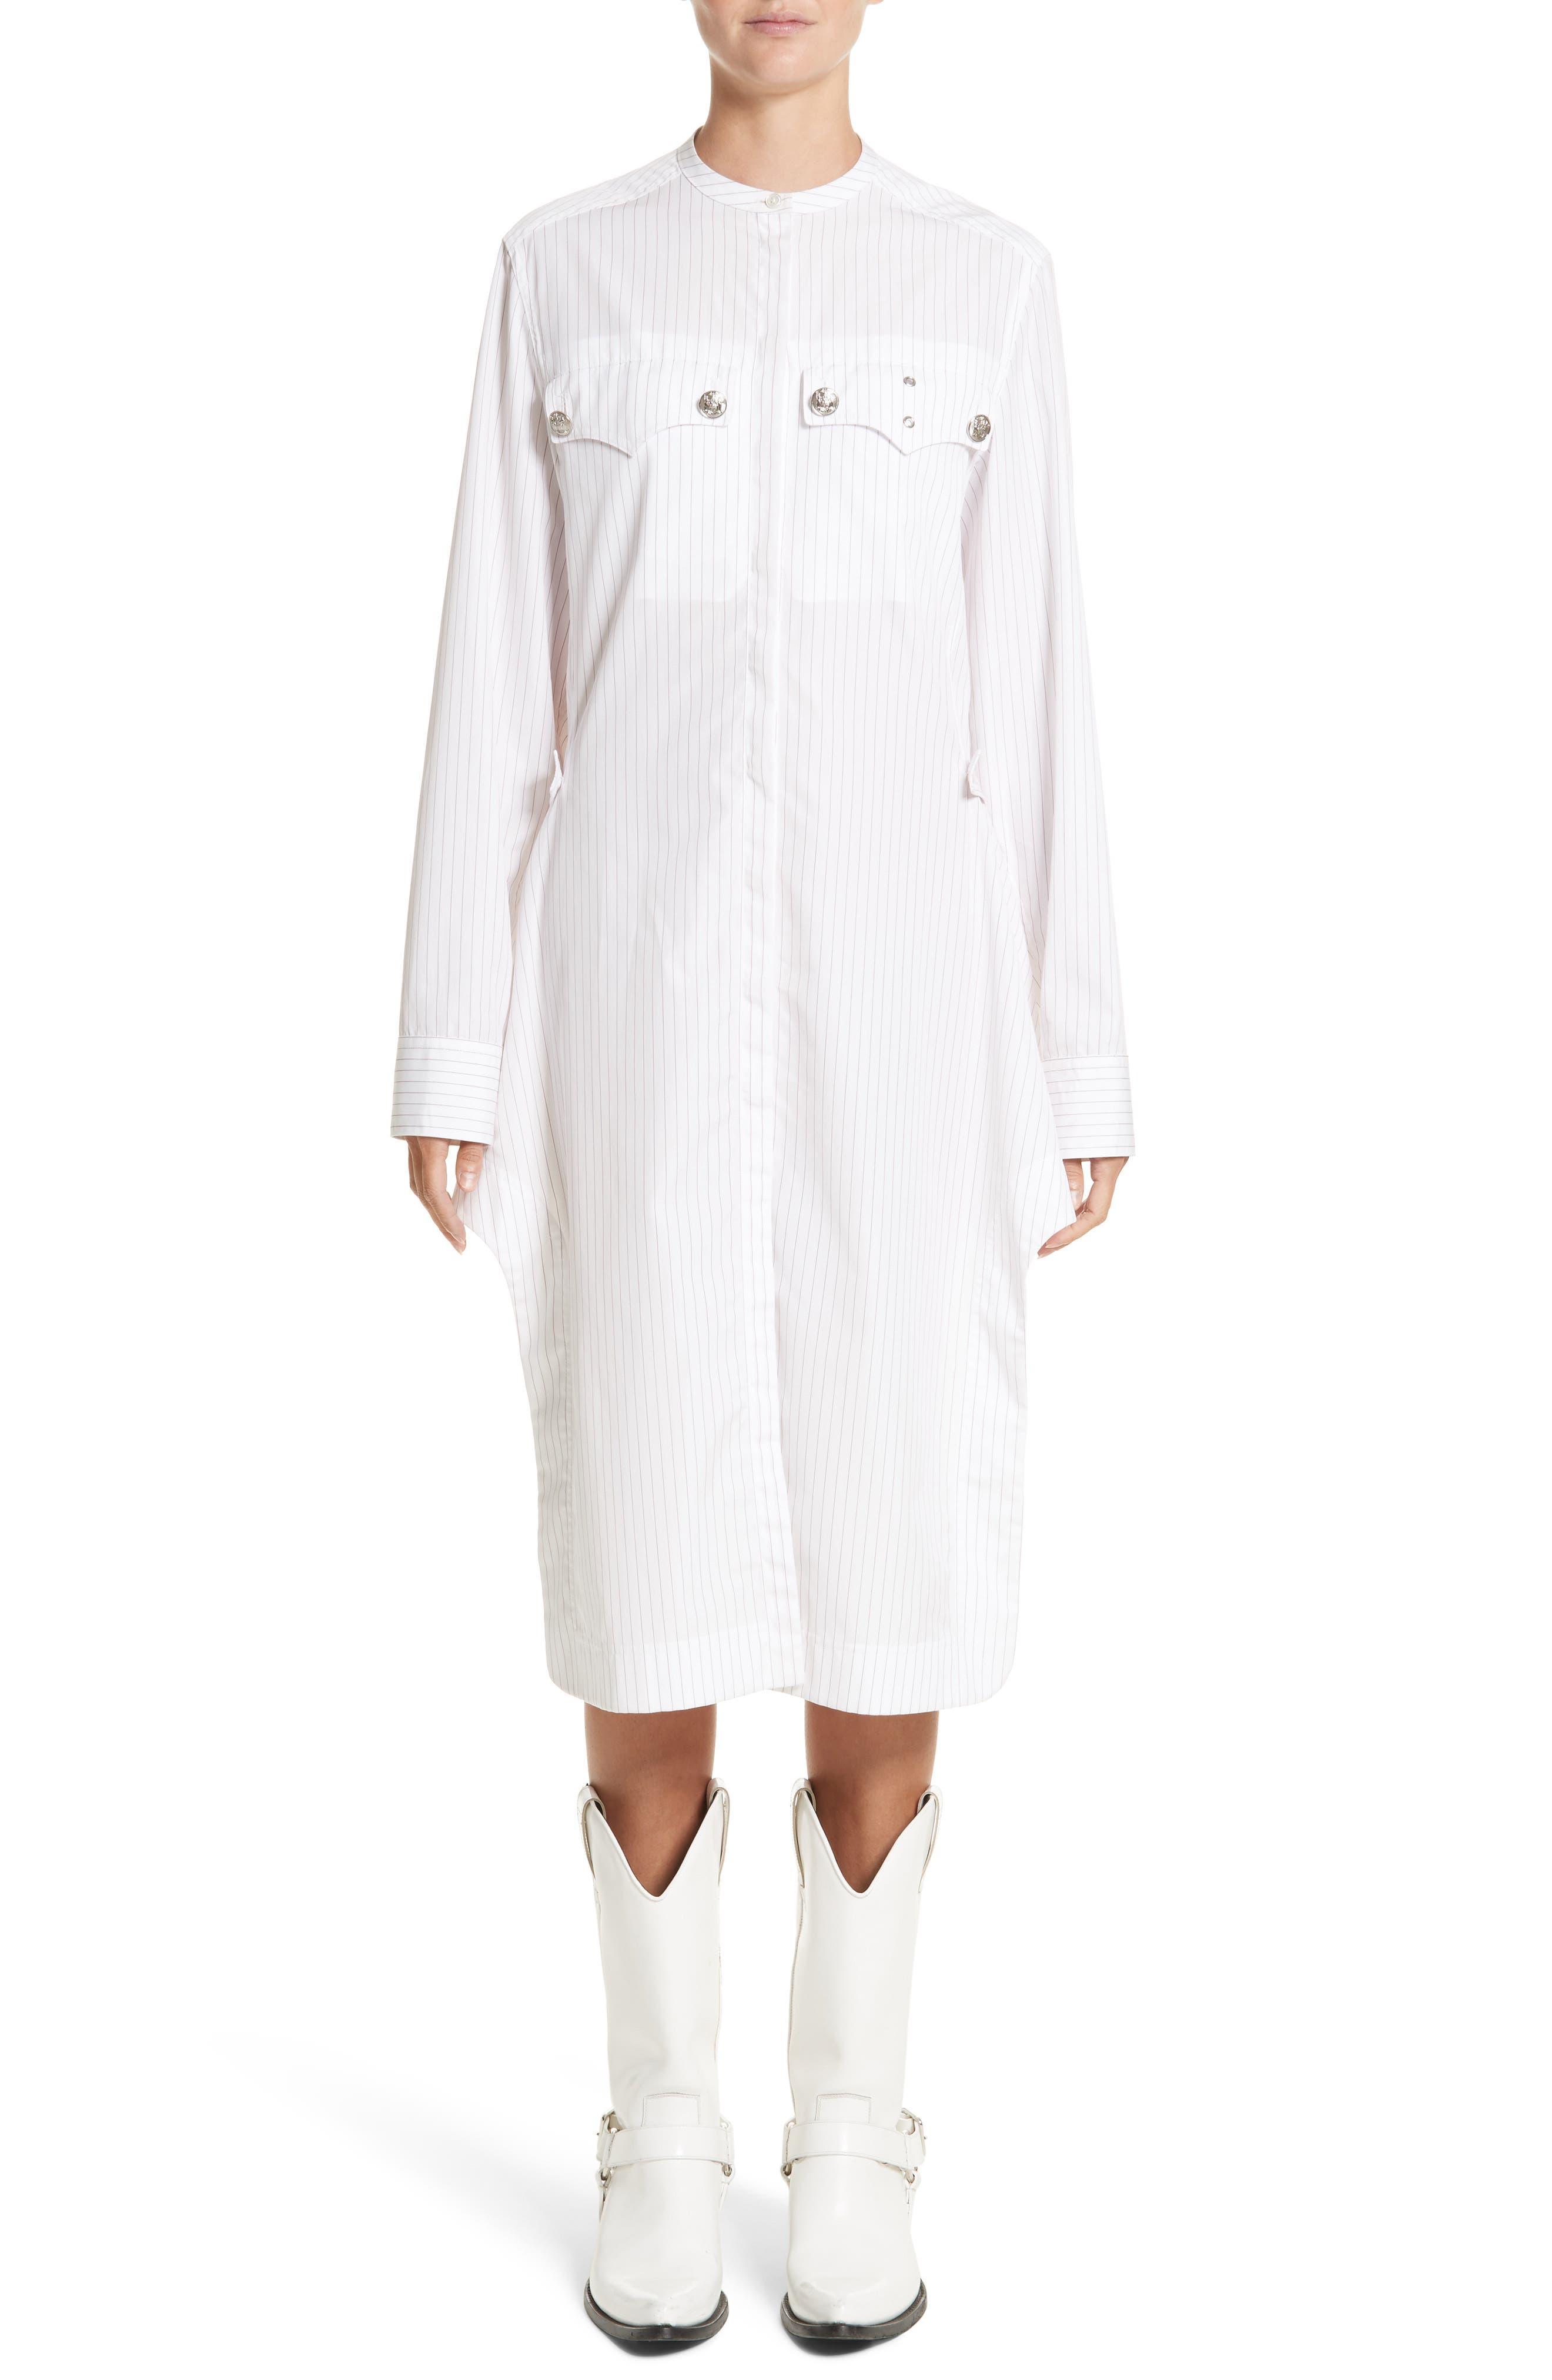 Main Image - Calvin Klein 205W39NYC Pinstripe Cotton Poplin Dress